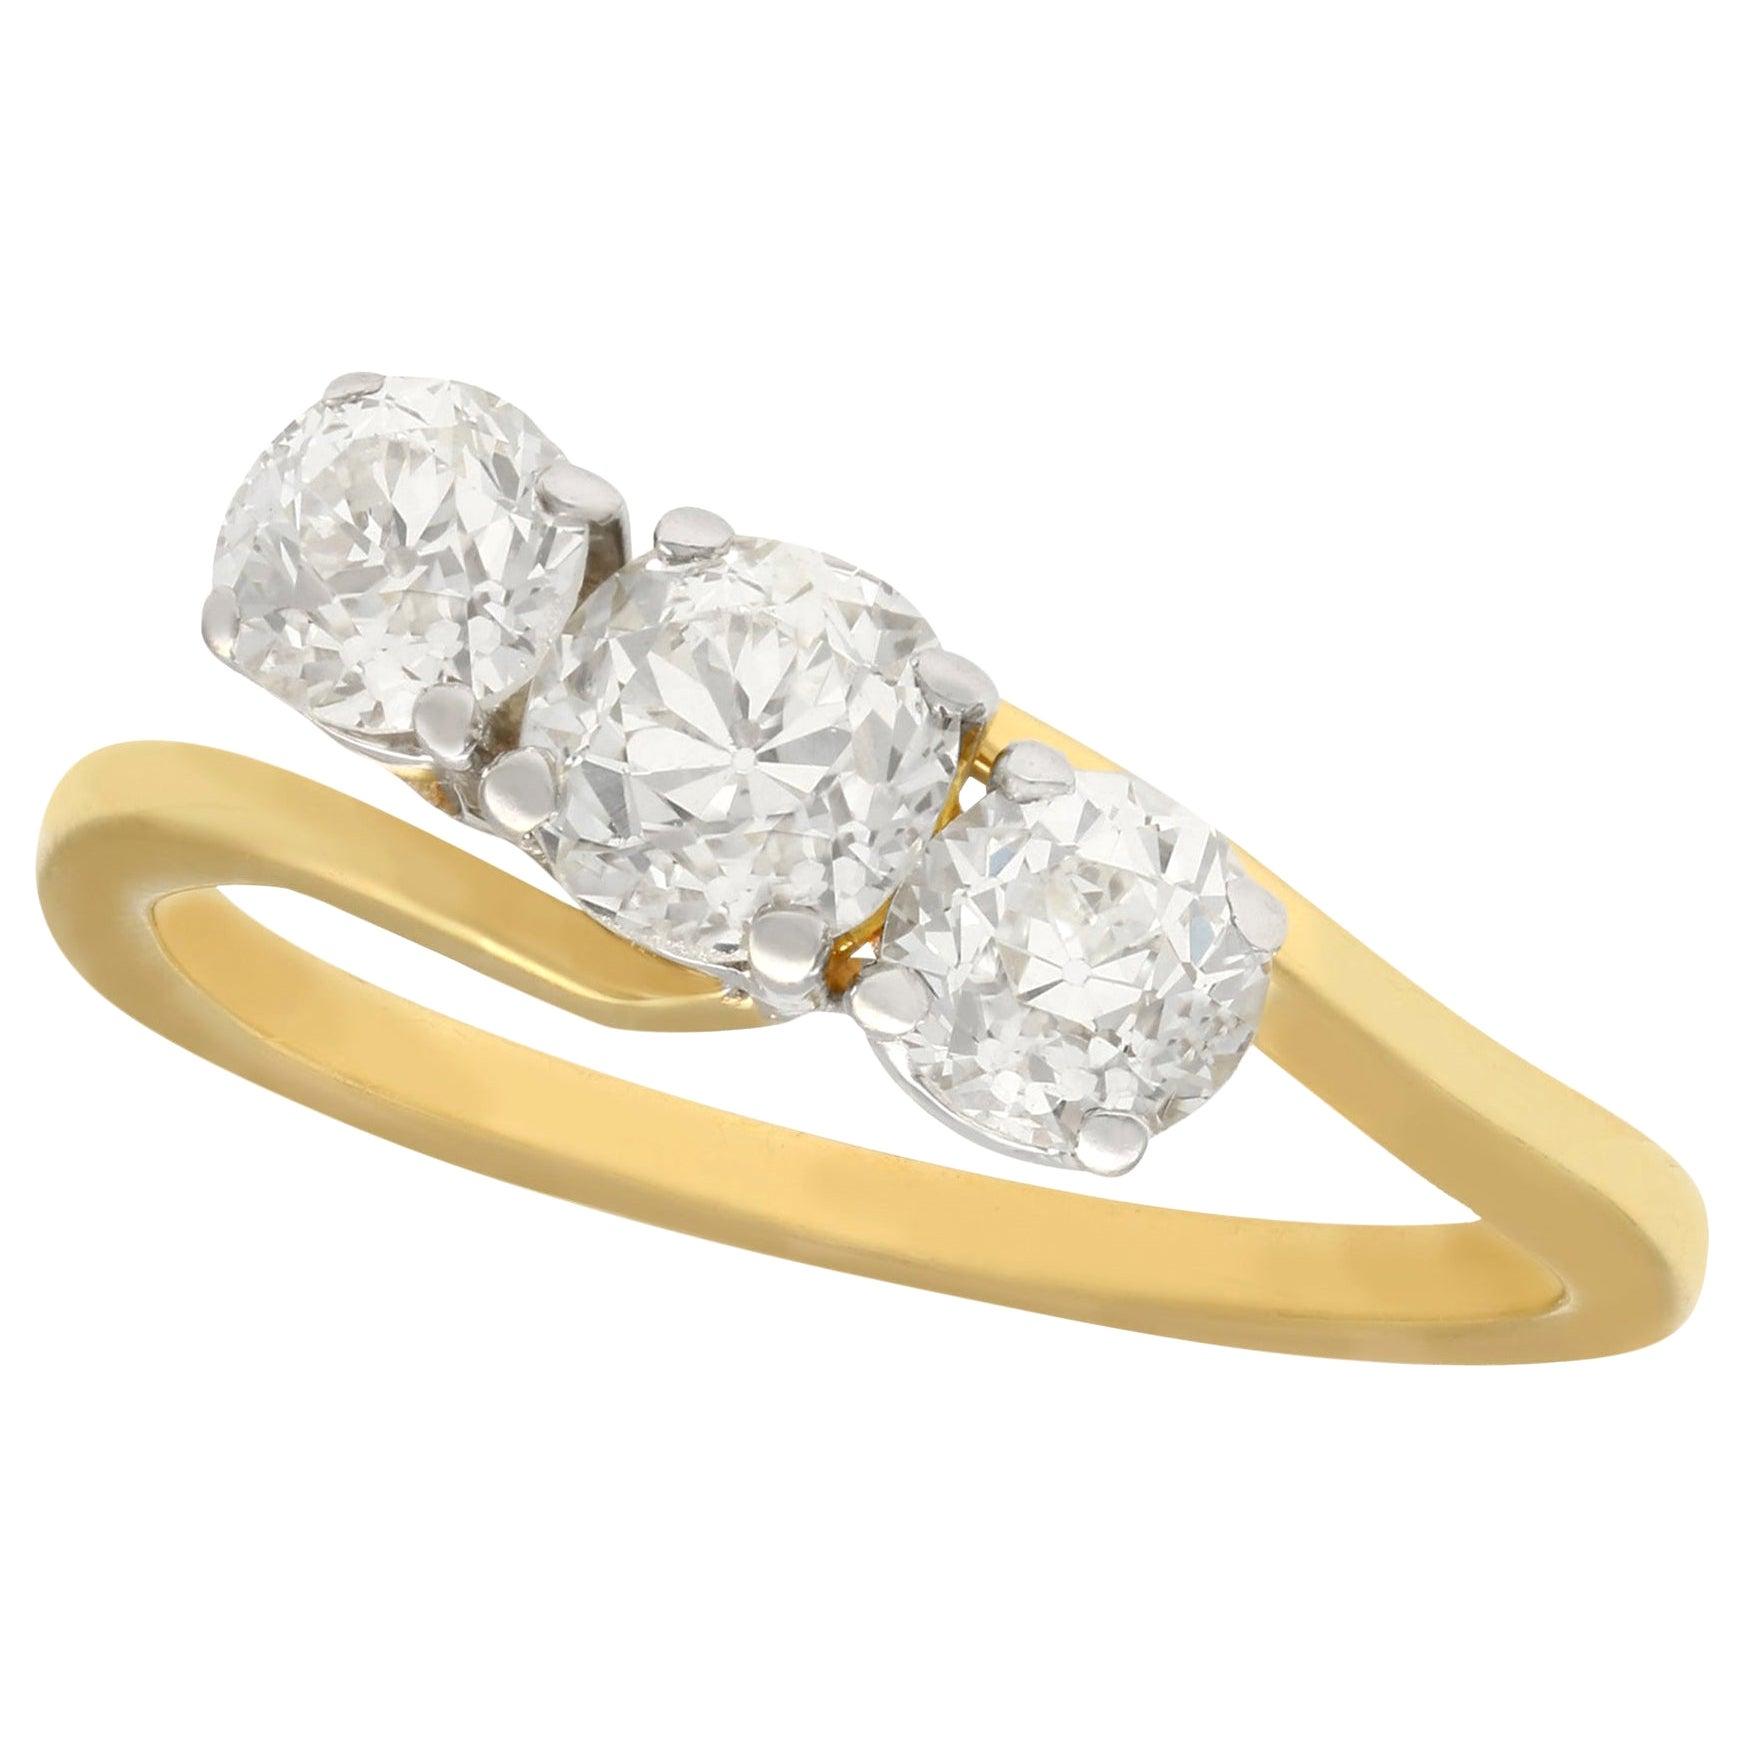 Antique 1900s 2.04 Carat Diamond Yellow Gold Trilogy Ring